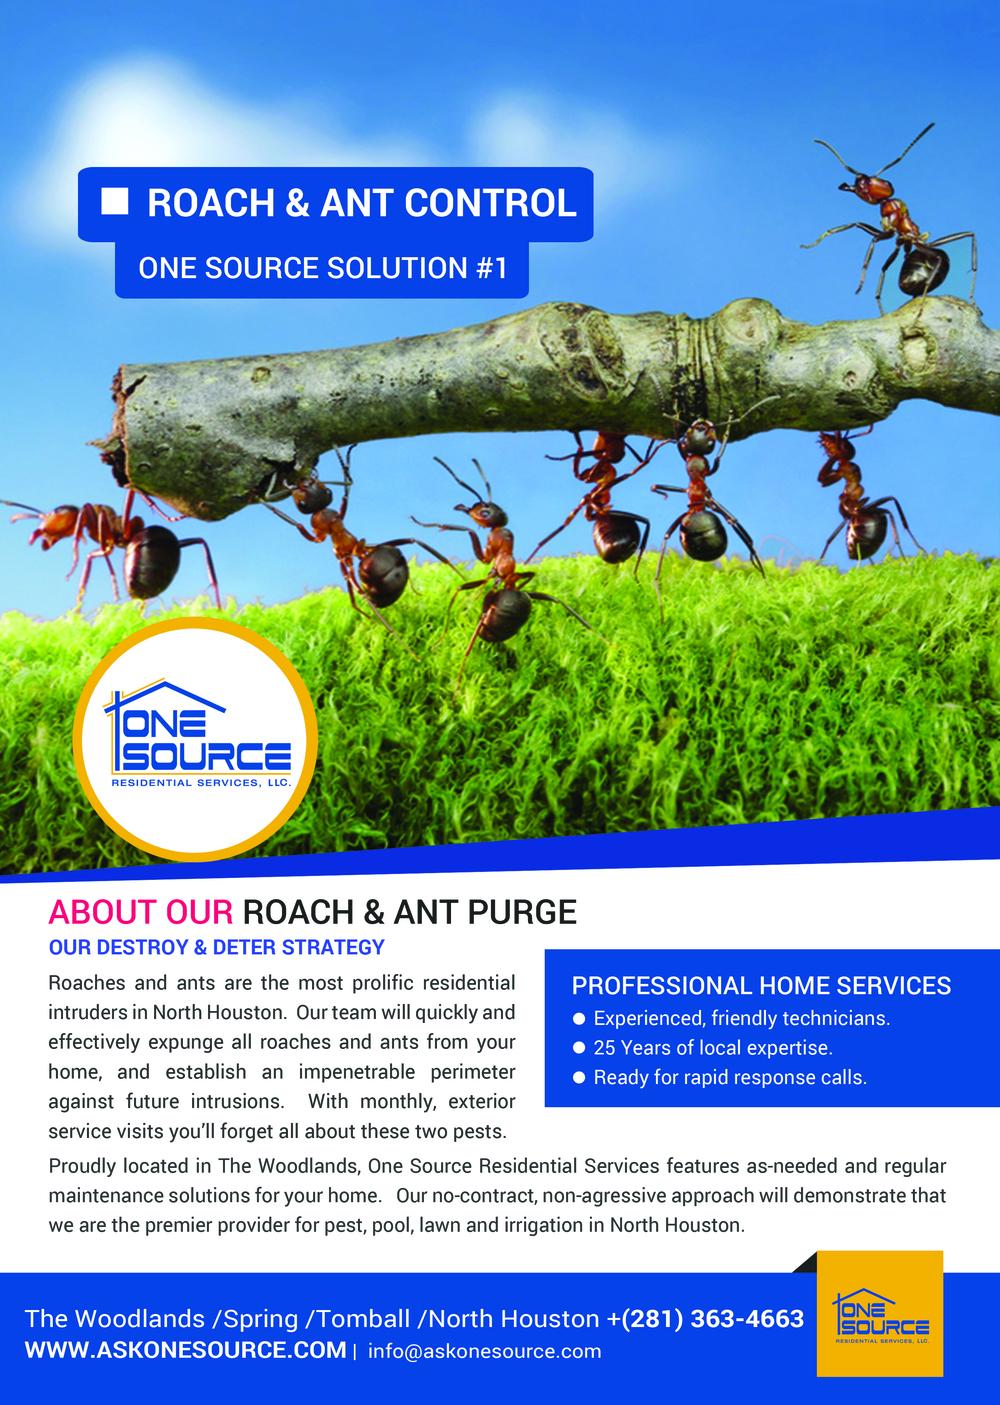 FlyerOneSourceRoach-Ant#1.jpg